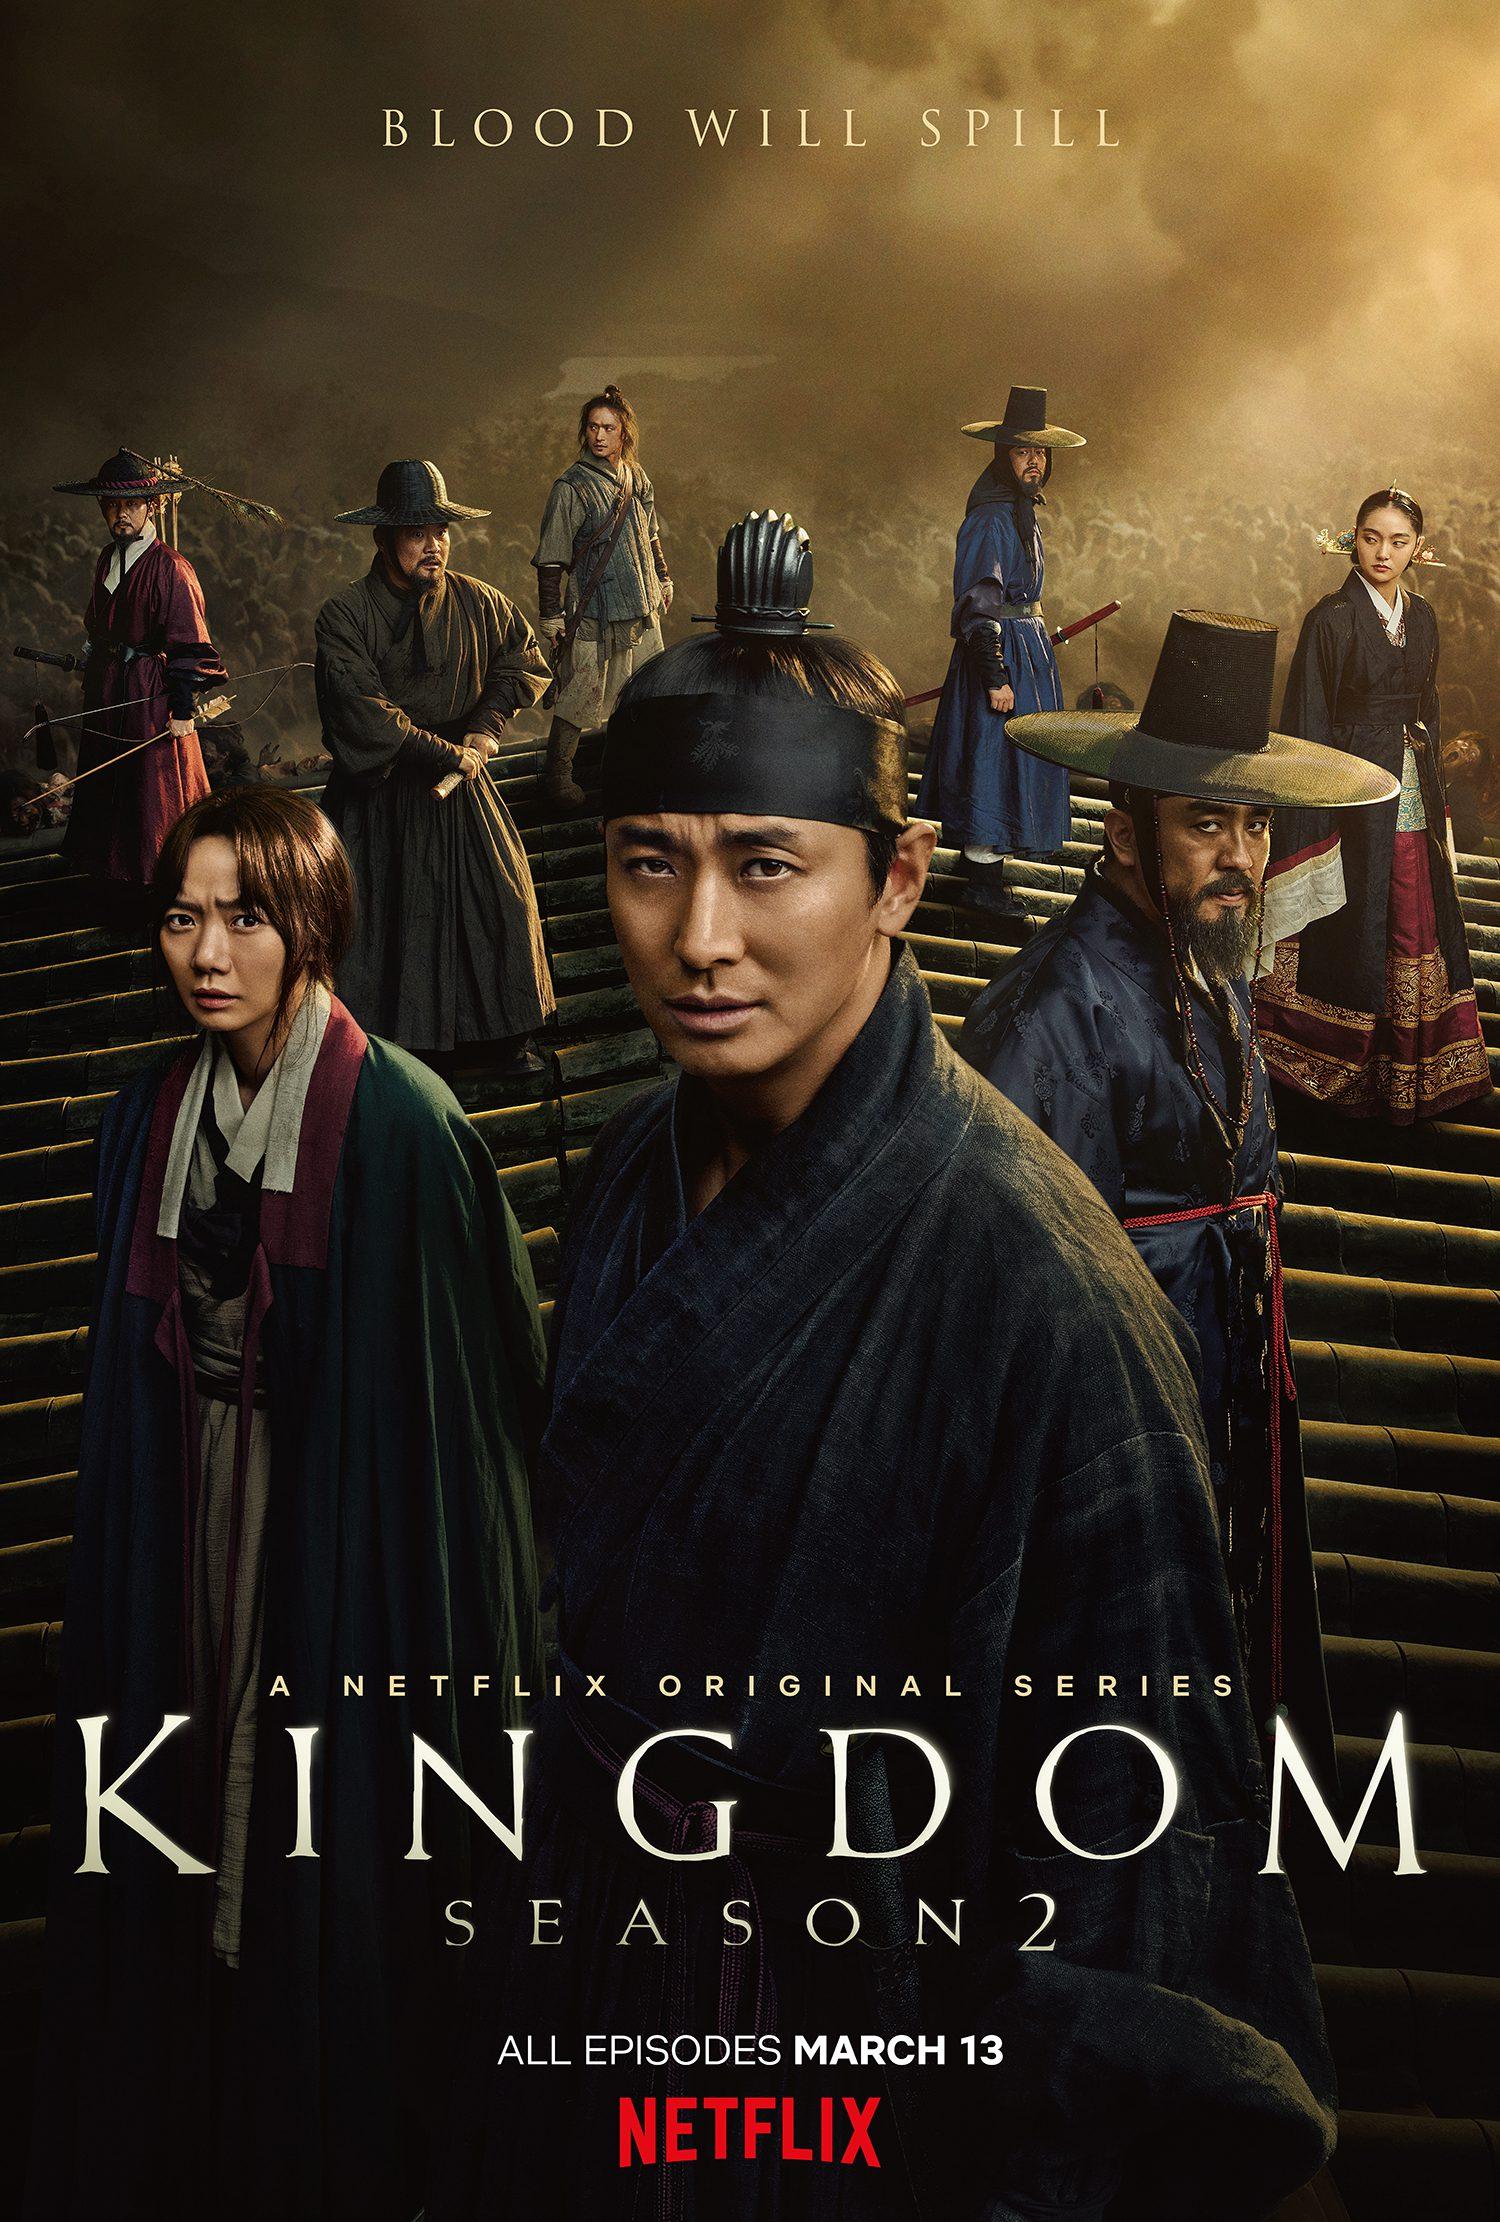 kingdom season 2 ending explained